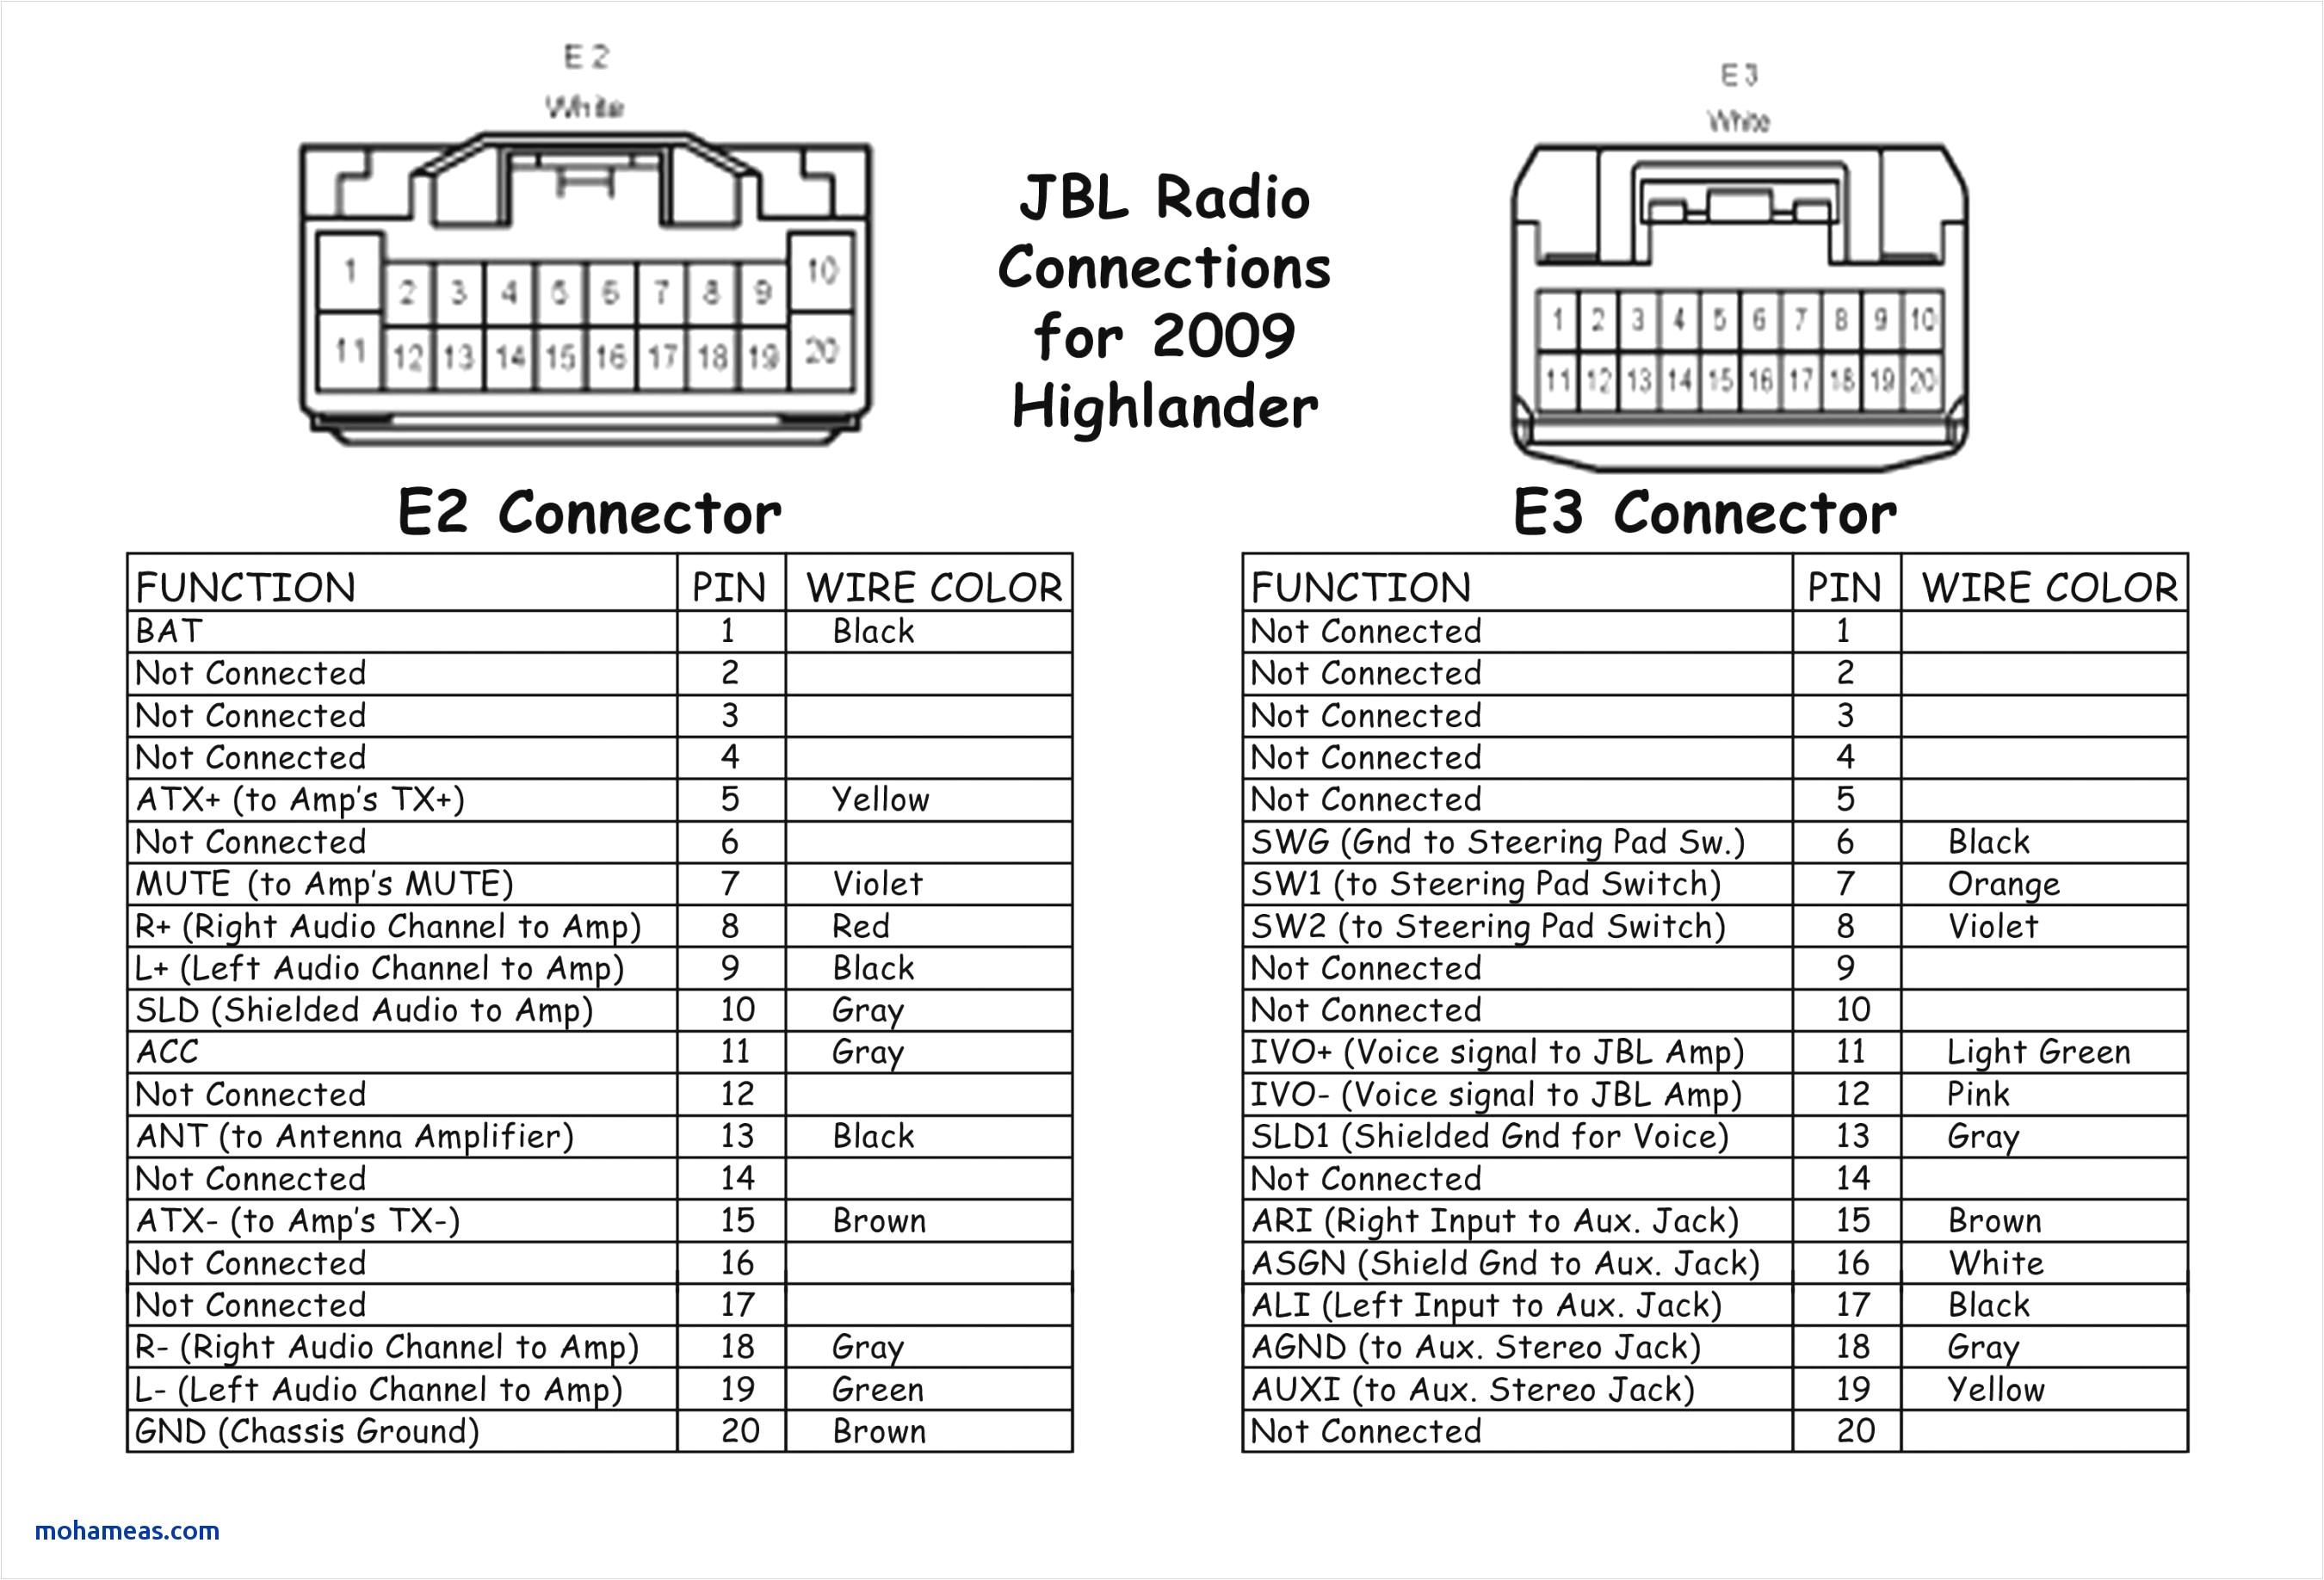 hitachi radio wiring harness wiring diagram split hitachi radio wiring harness